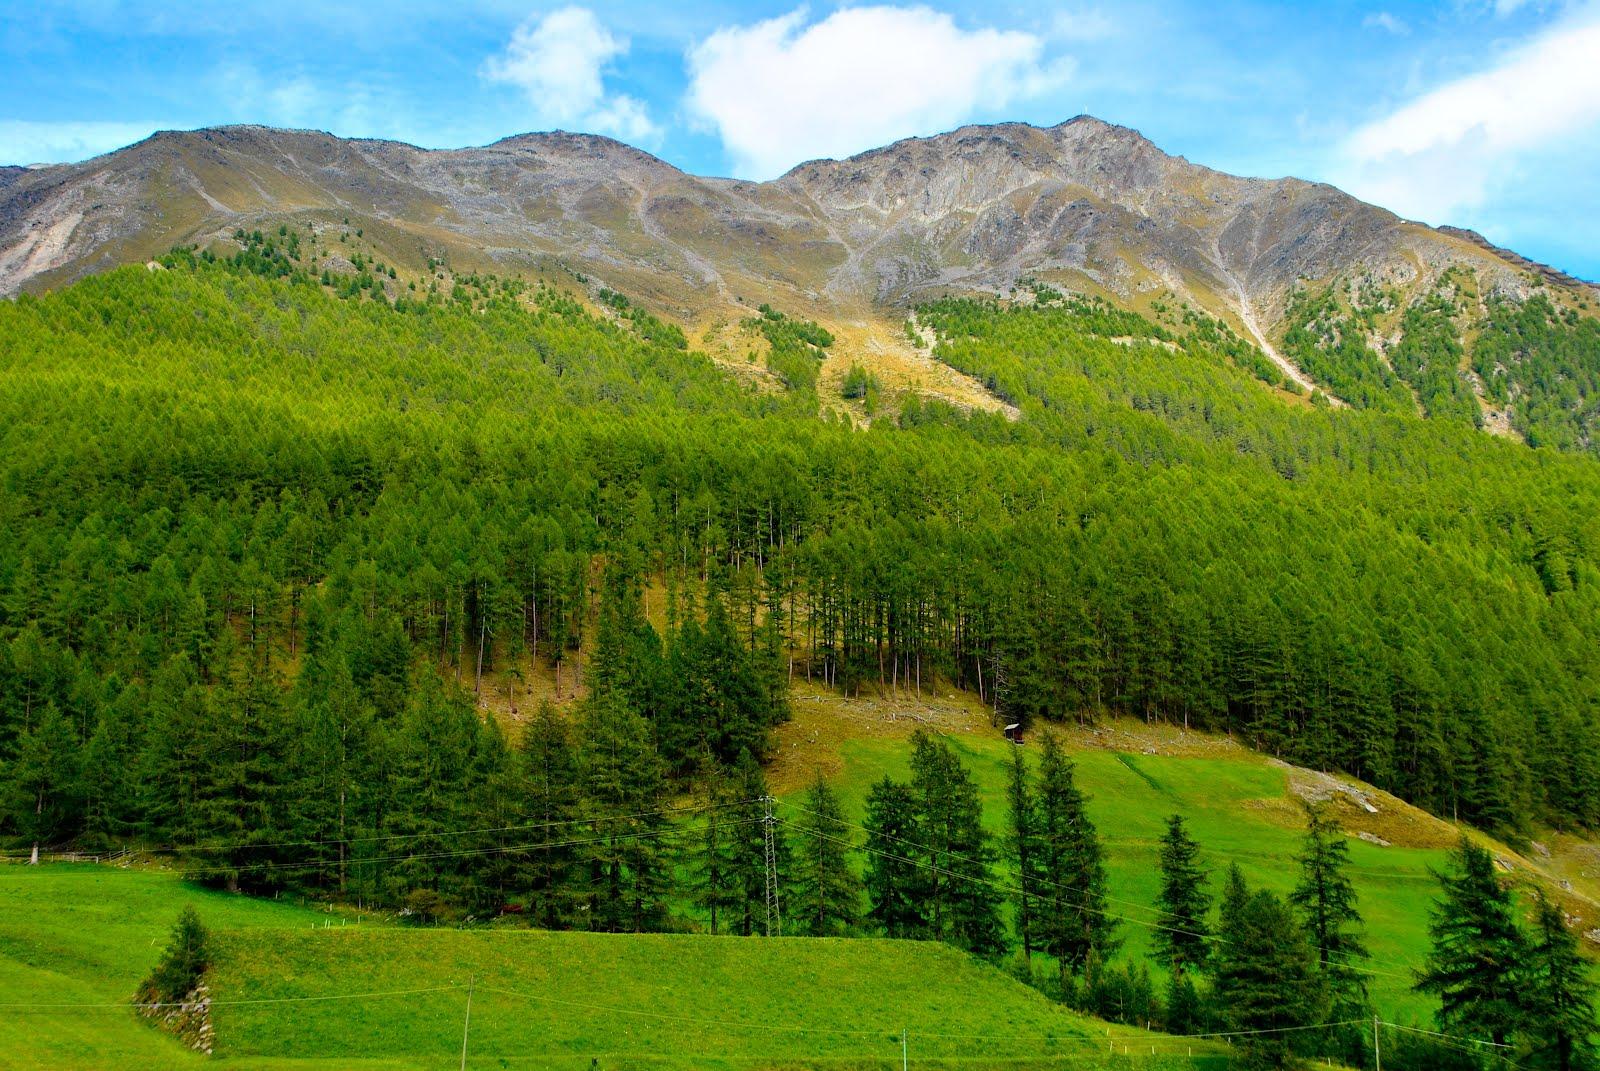 http://2.bp.blogspot.com/-nrX2ZfZANxc/T86GQTn0hUI/AAAAAAAA6iM/RkQbqGsiBNU/s1600/vista-de-las-monta%25C3%25B1as-dolomitas-dolomites-mountains-pinos-paisaje-.jpg